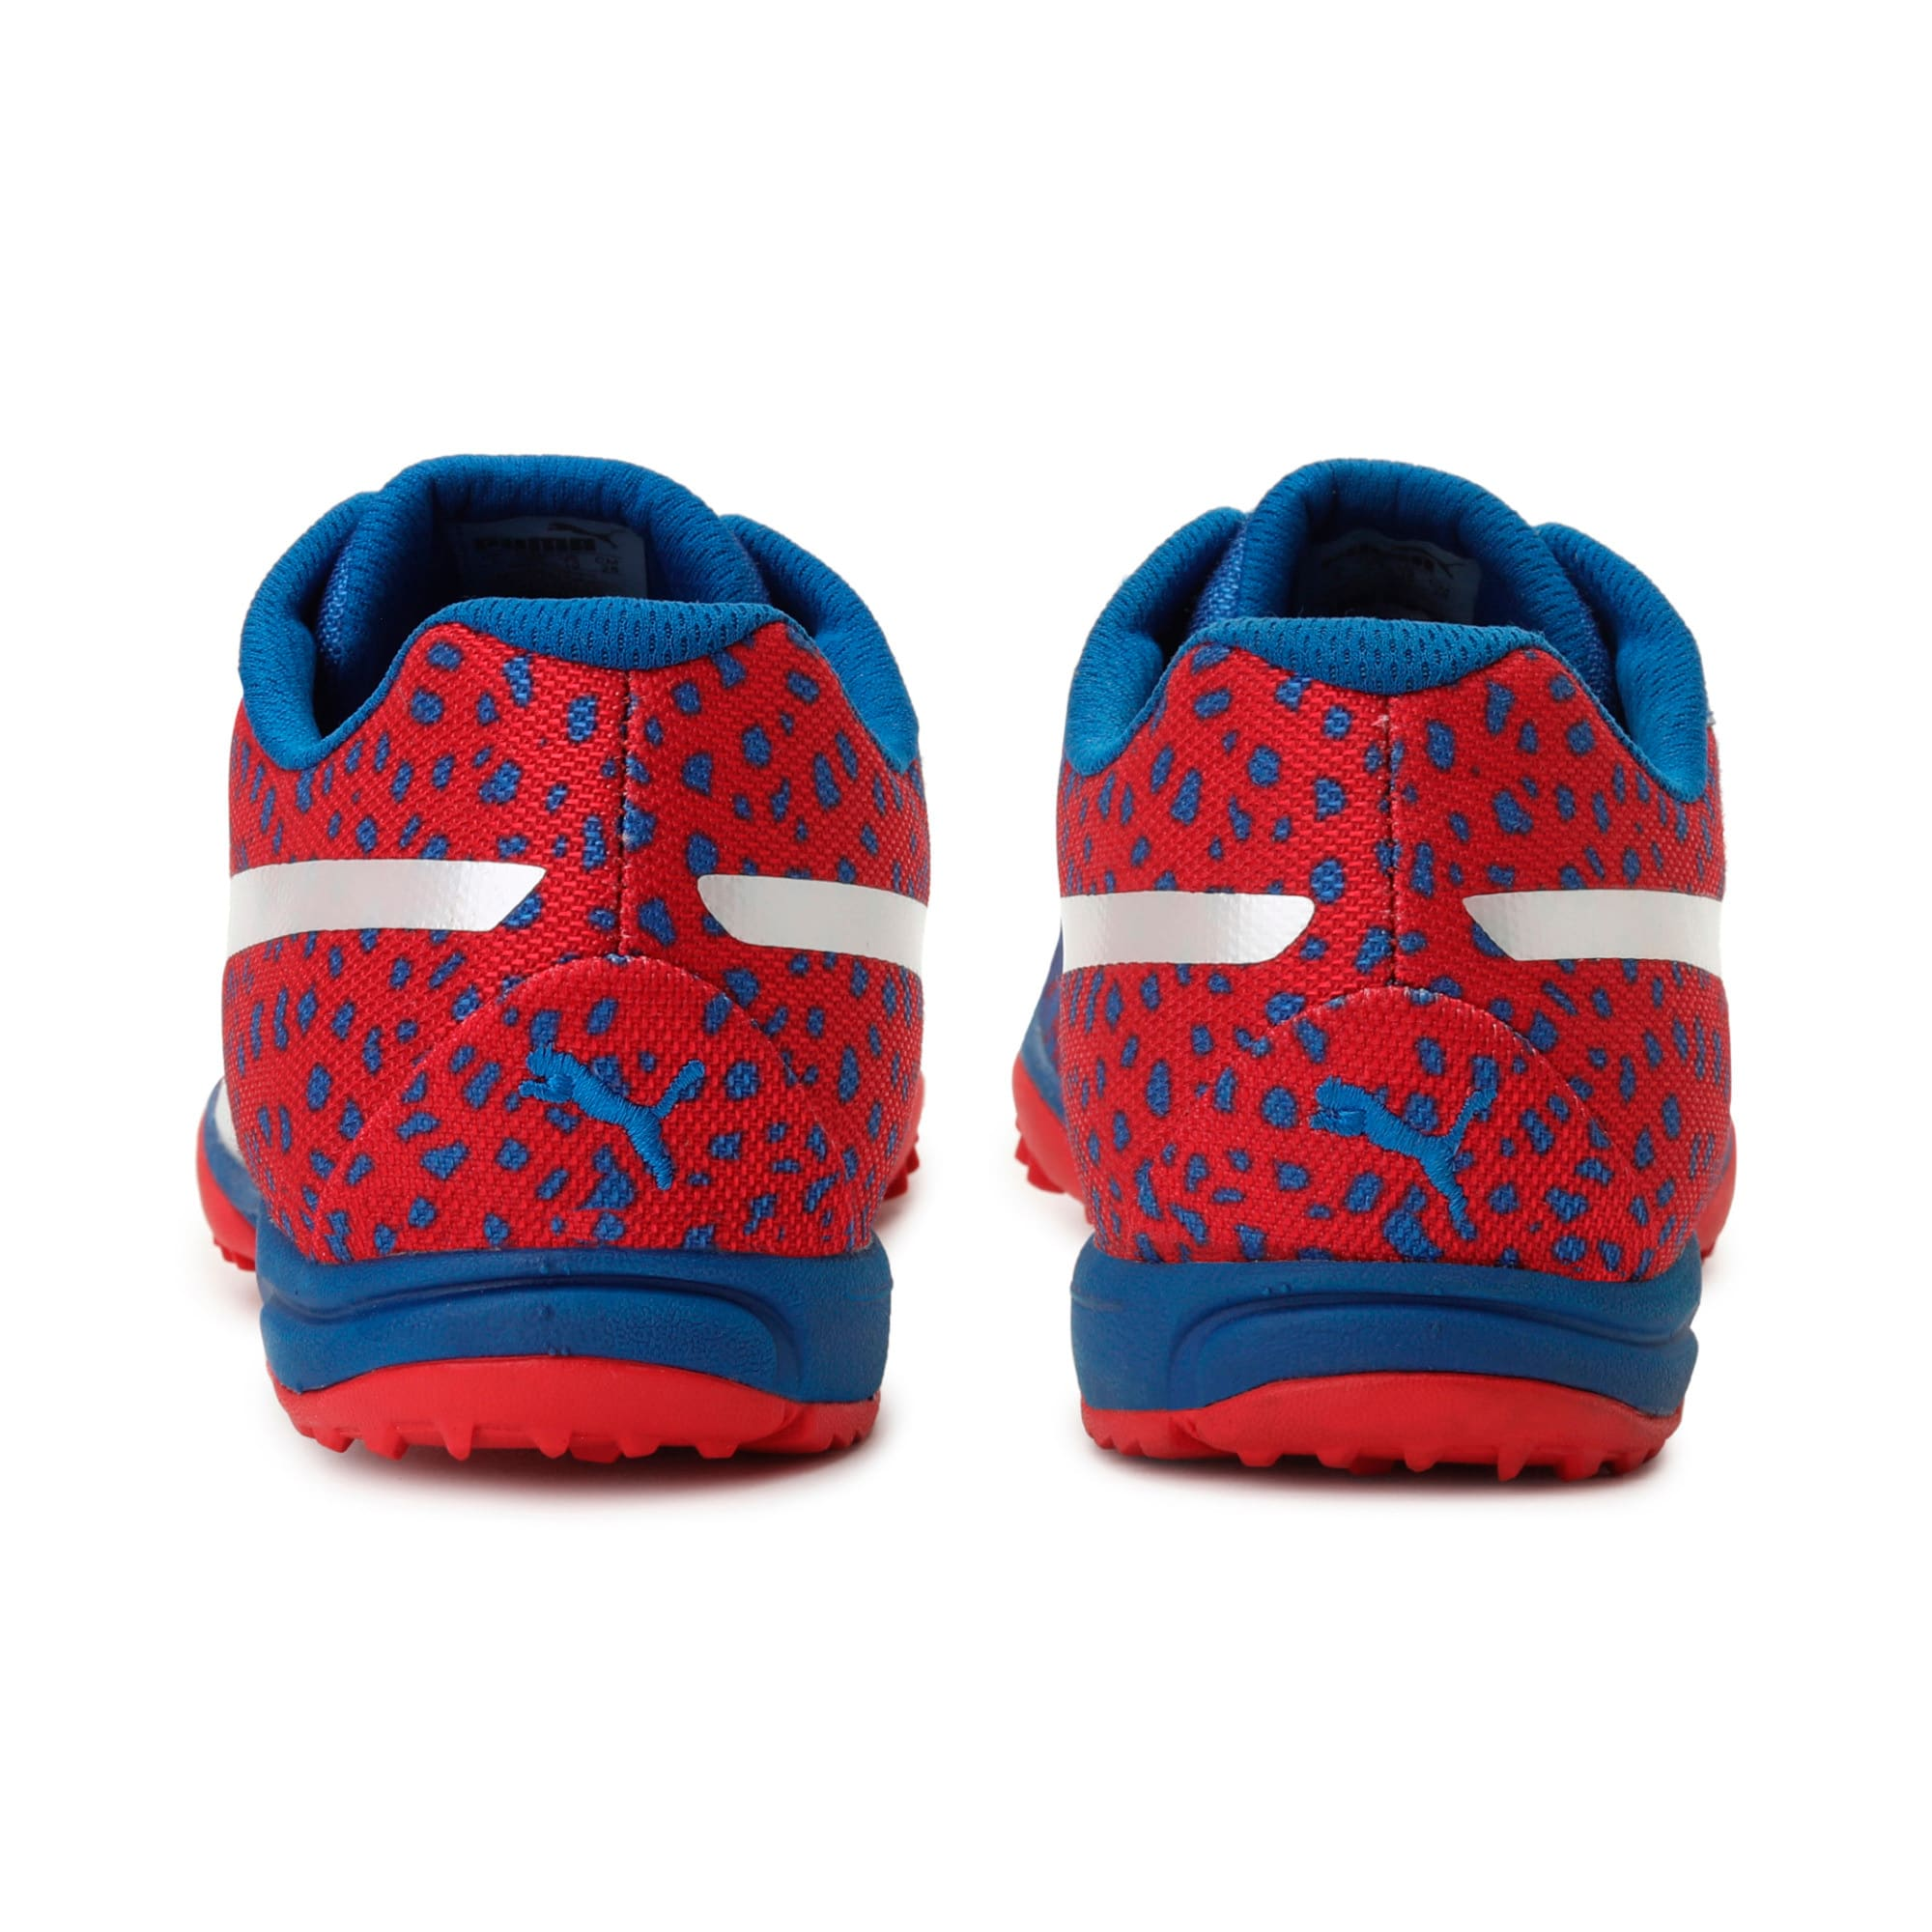 Thumbnail 5 of evoSPEED Haraka 4 Men's Cross Country Running Shoes, Lapis Blue-Toreador, medium-IND